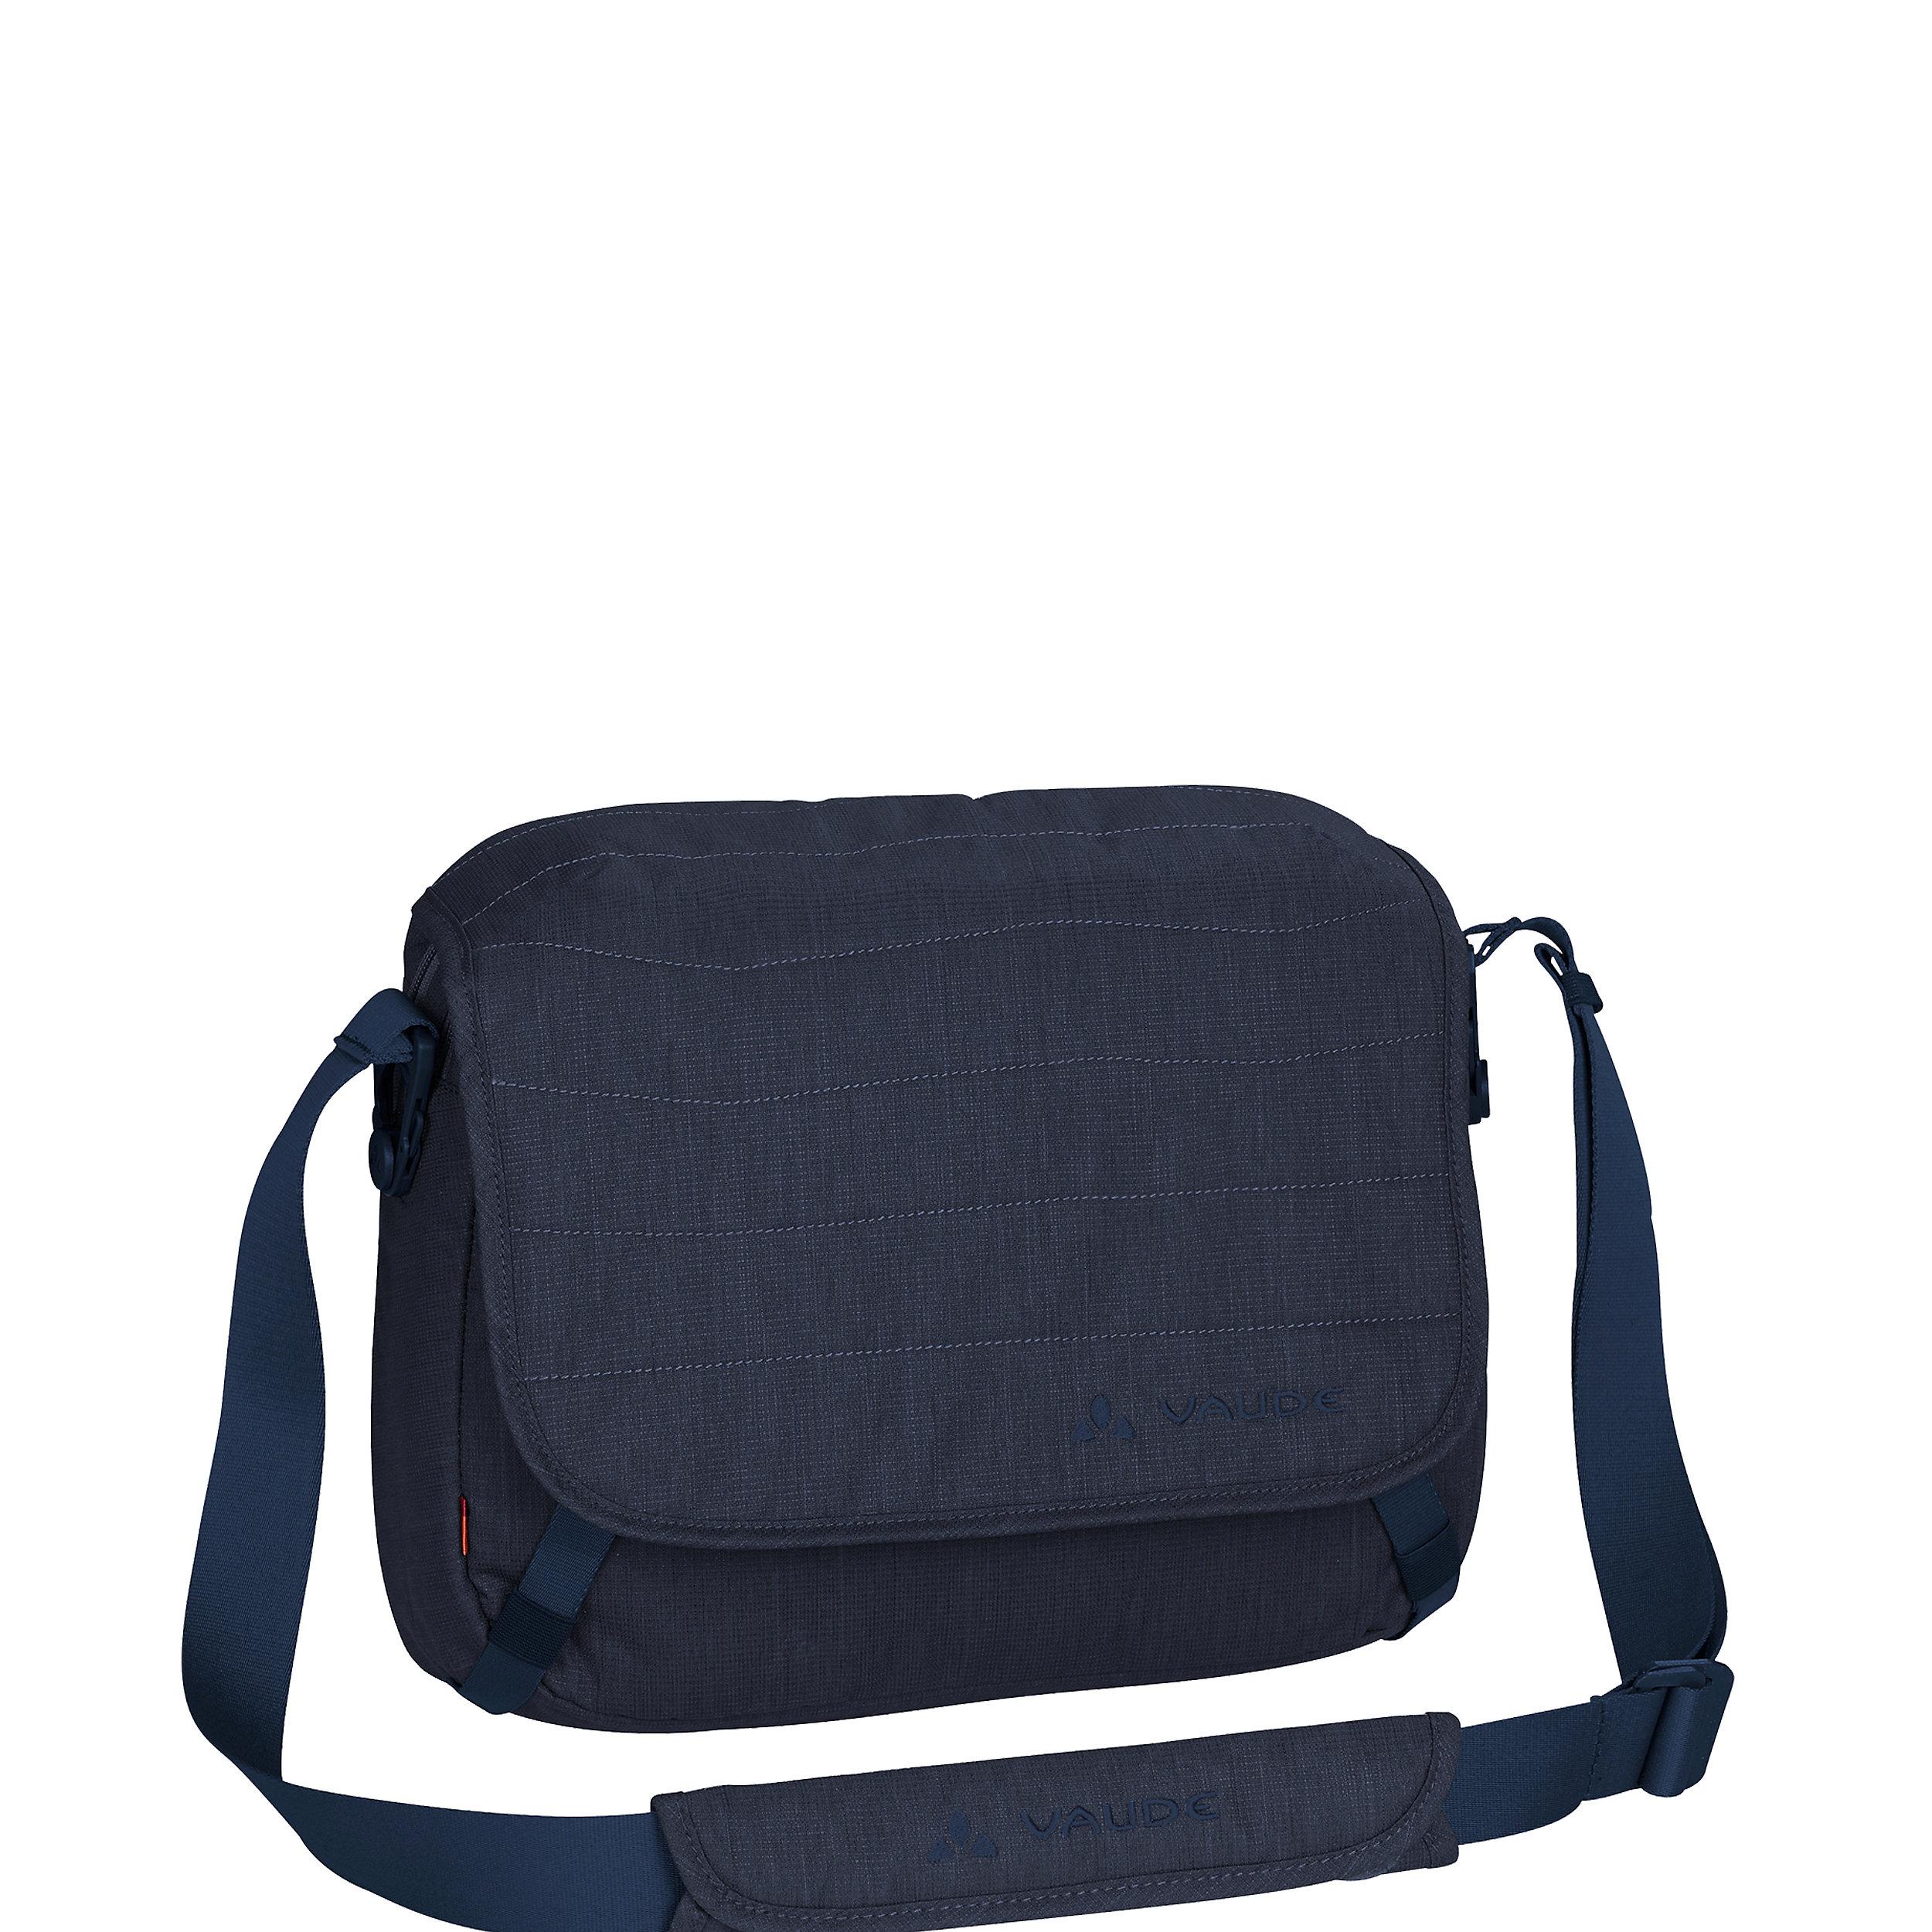 "Messenger Bag haPET II 13,3"" Recycled 11 Liter"